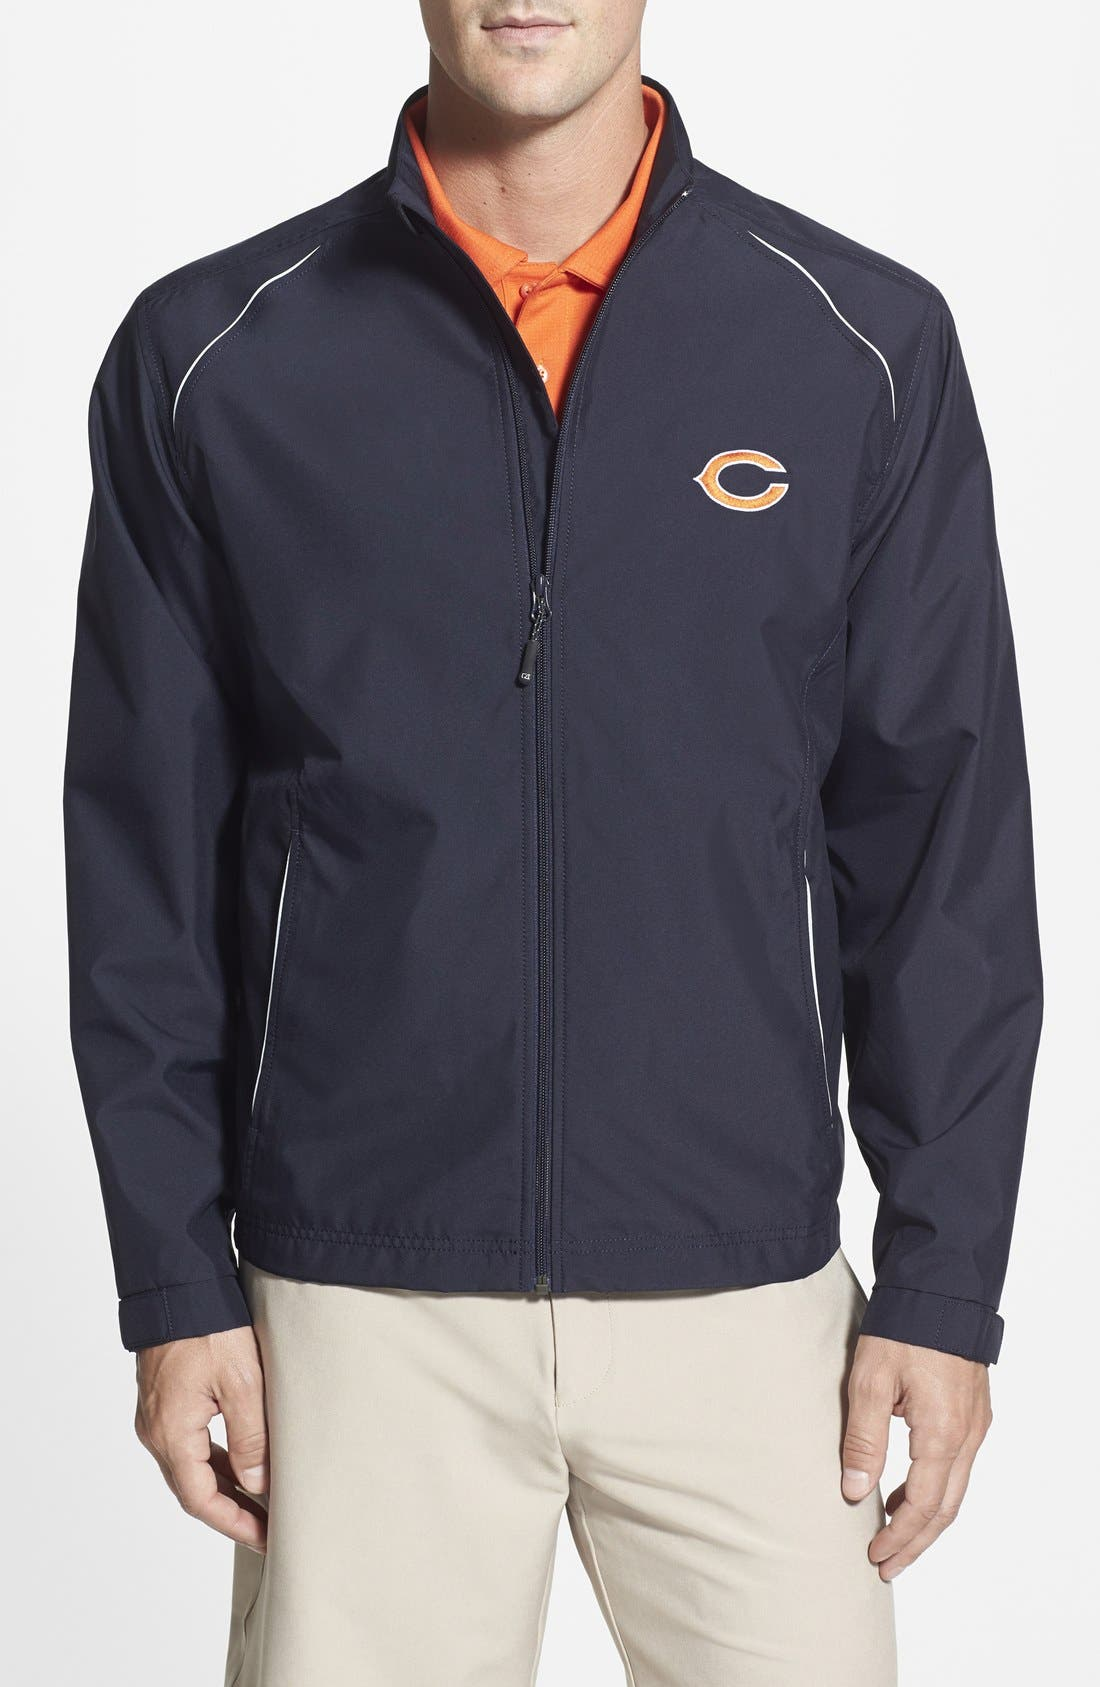 'Chicago Bears - Beacon' WeatherTec Wind & Water Resistant Jacket,                         Main,                         color, Navy